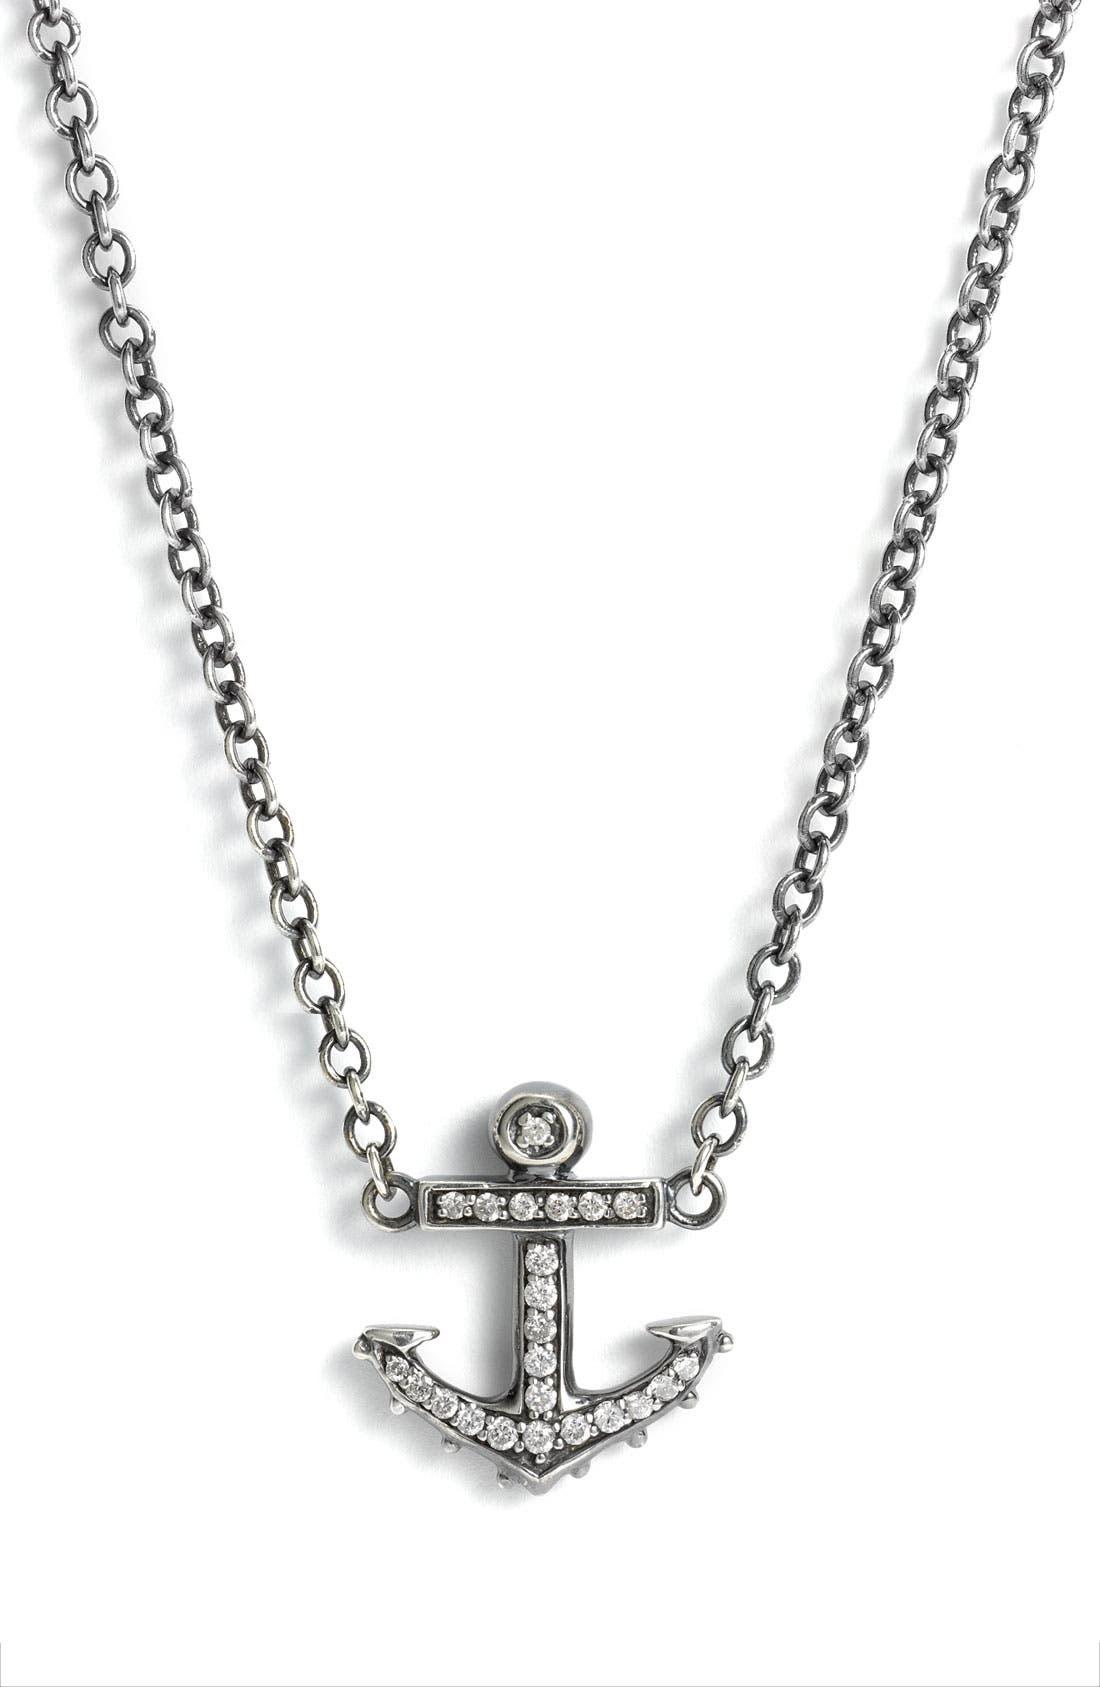 Main Image - Elizabeth and James 'Sea Creatures' Anchor & Sapphire Pendant Necklace